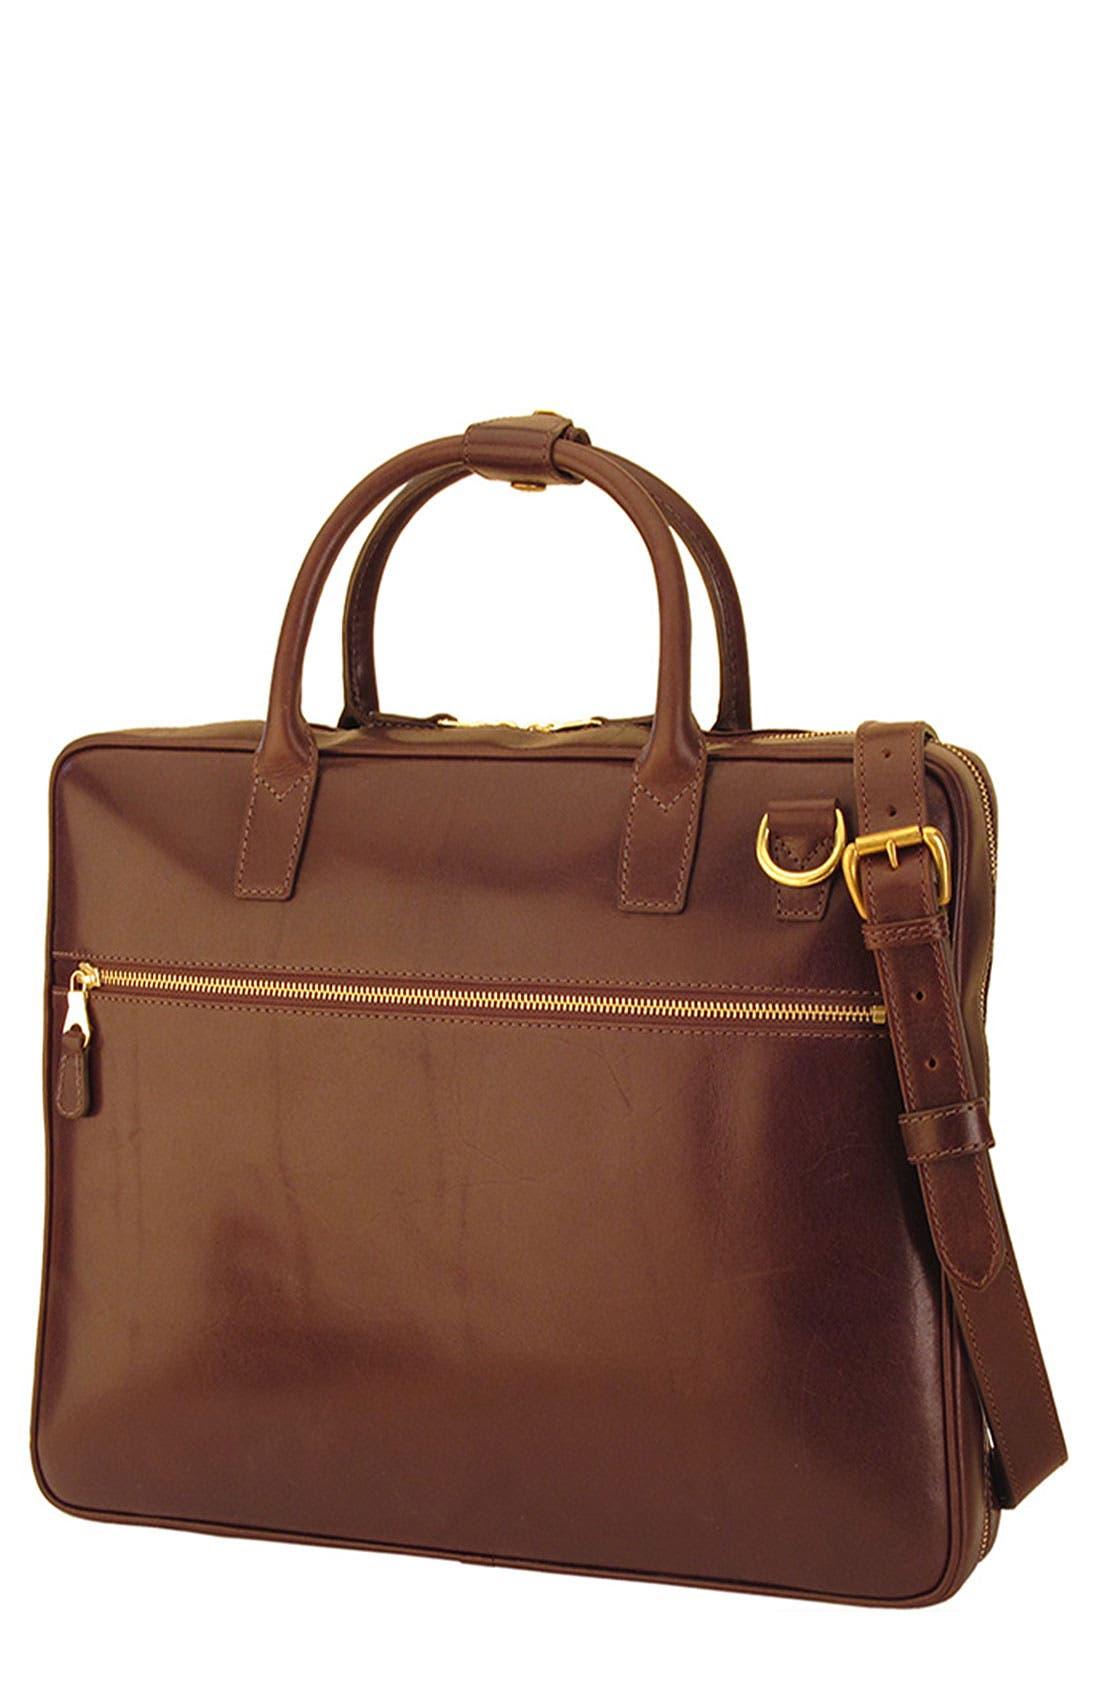 Alternate Image 1 Selected - Mulholland 'Slim' Leather Laptop Bag (17 Inch)